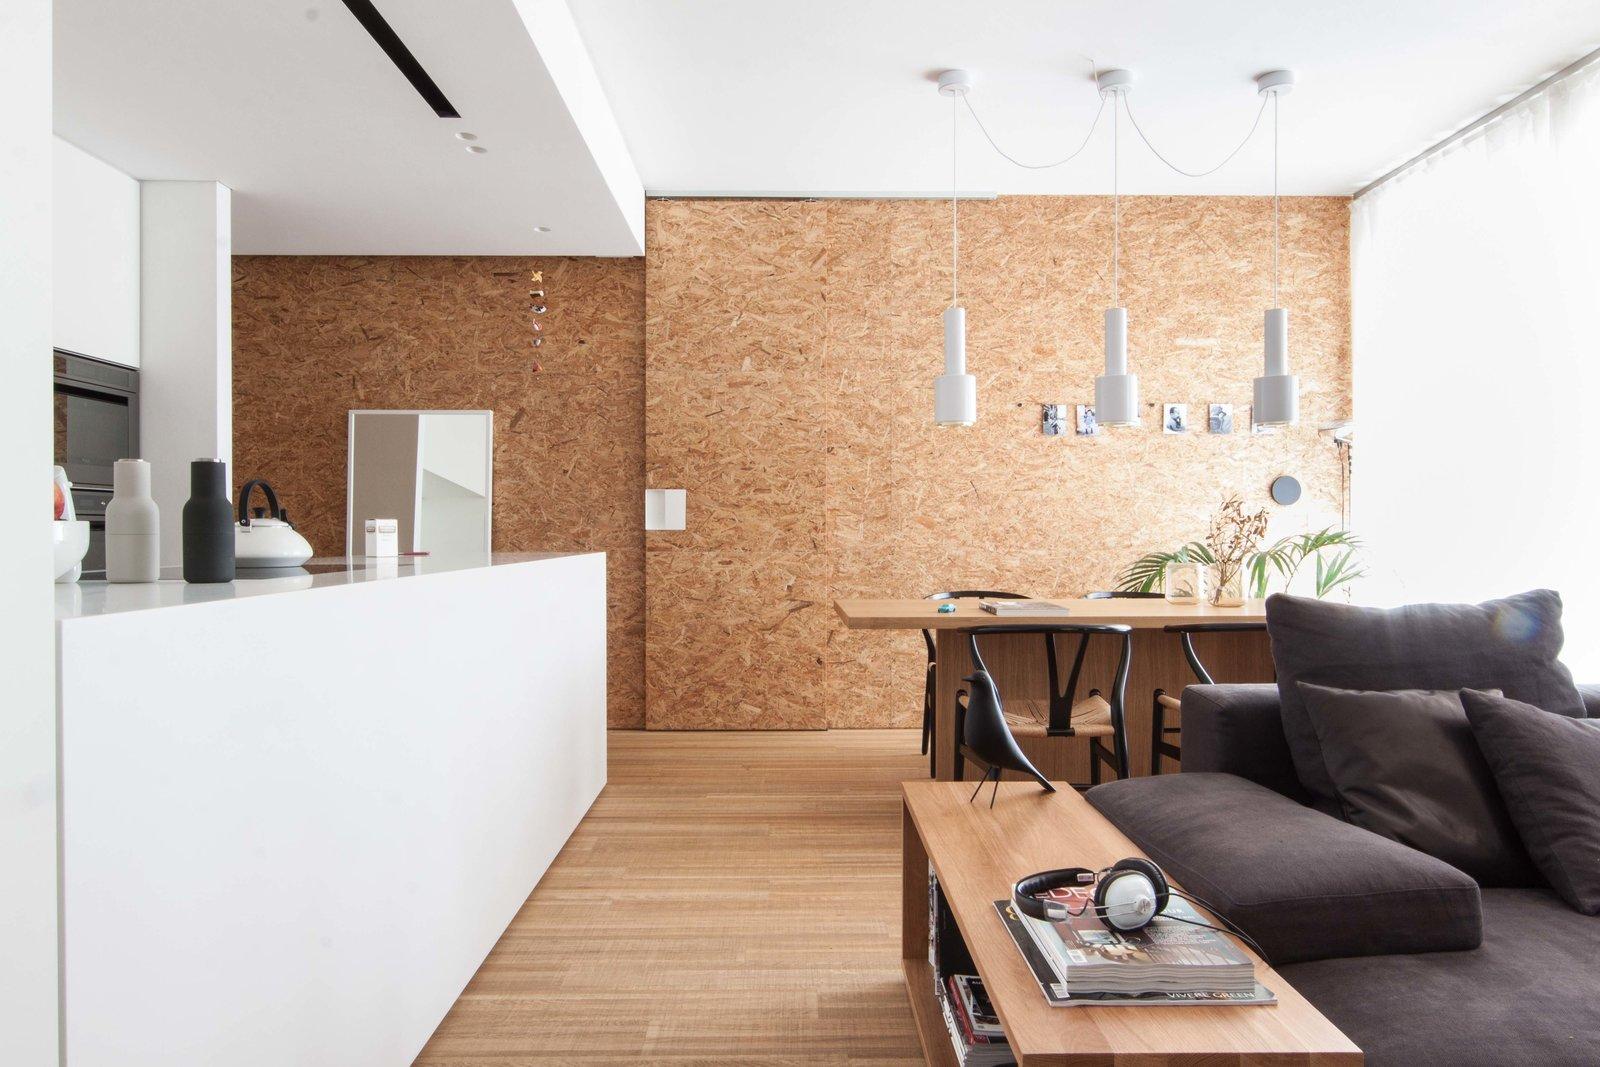 Living Room, Ceiling Lighting, Pendant Lighting, Bench, Sofa, and Medium Hardwood Floor  Interior LP by Didonè Comacchio